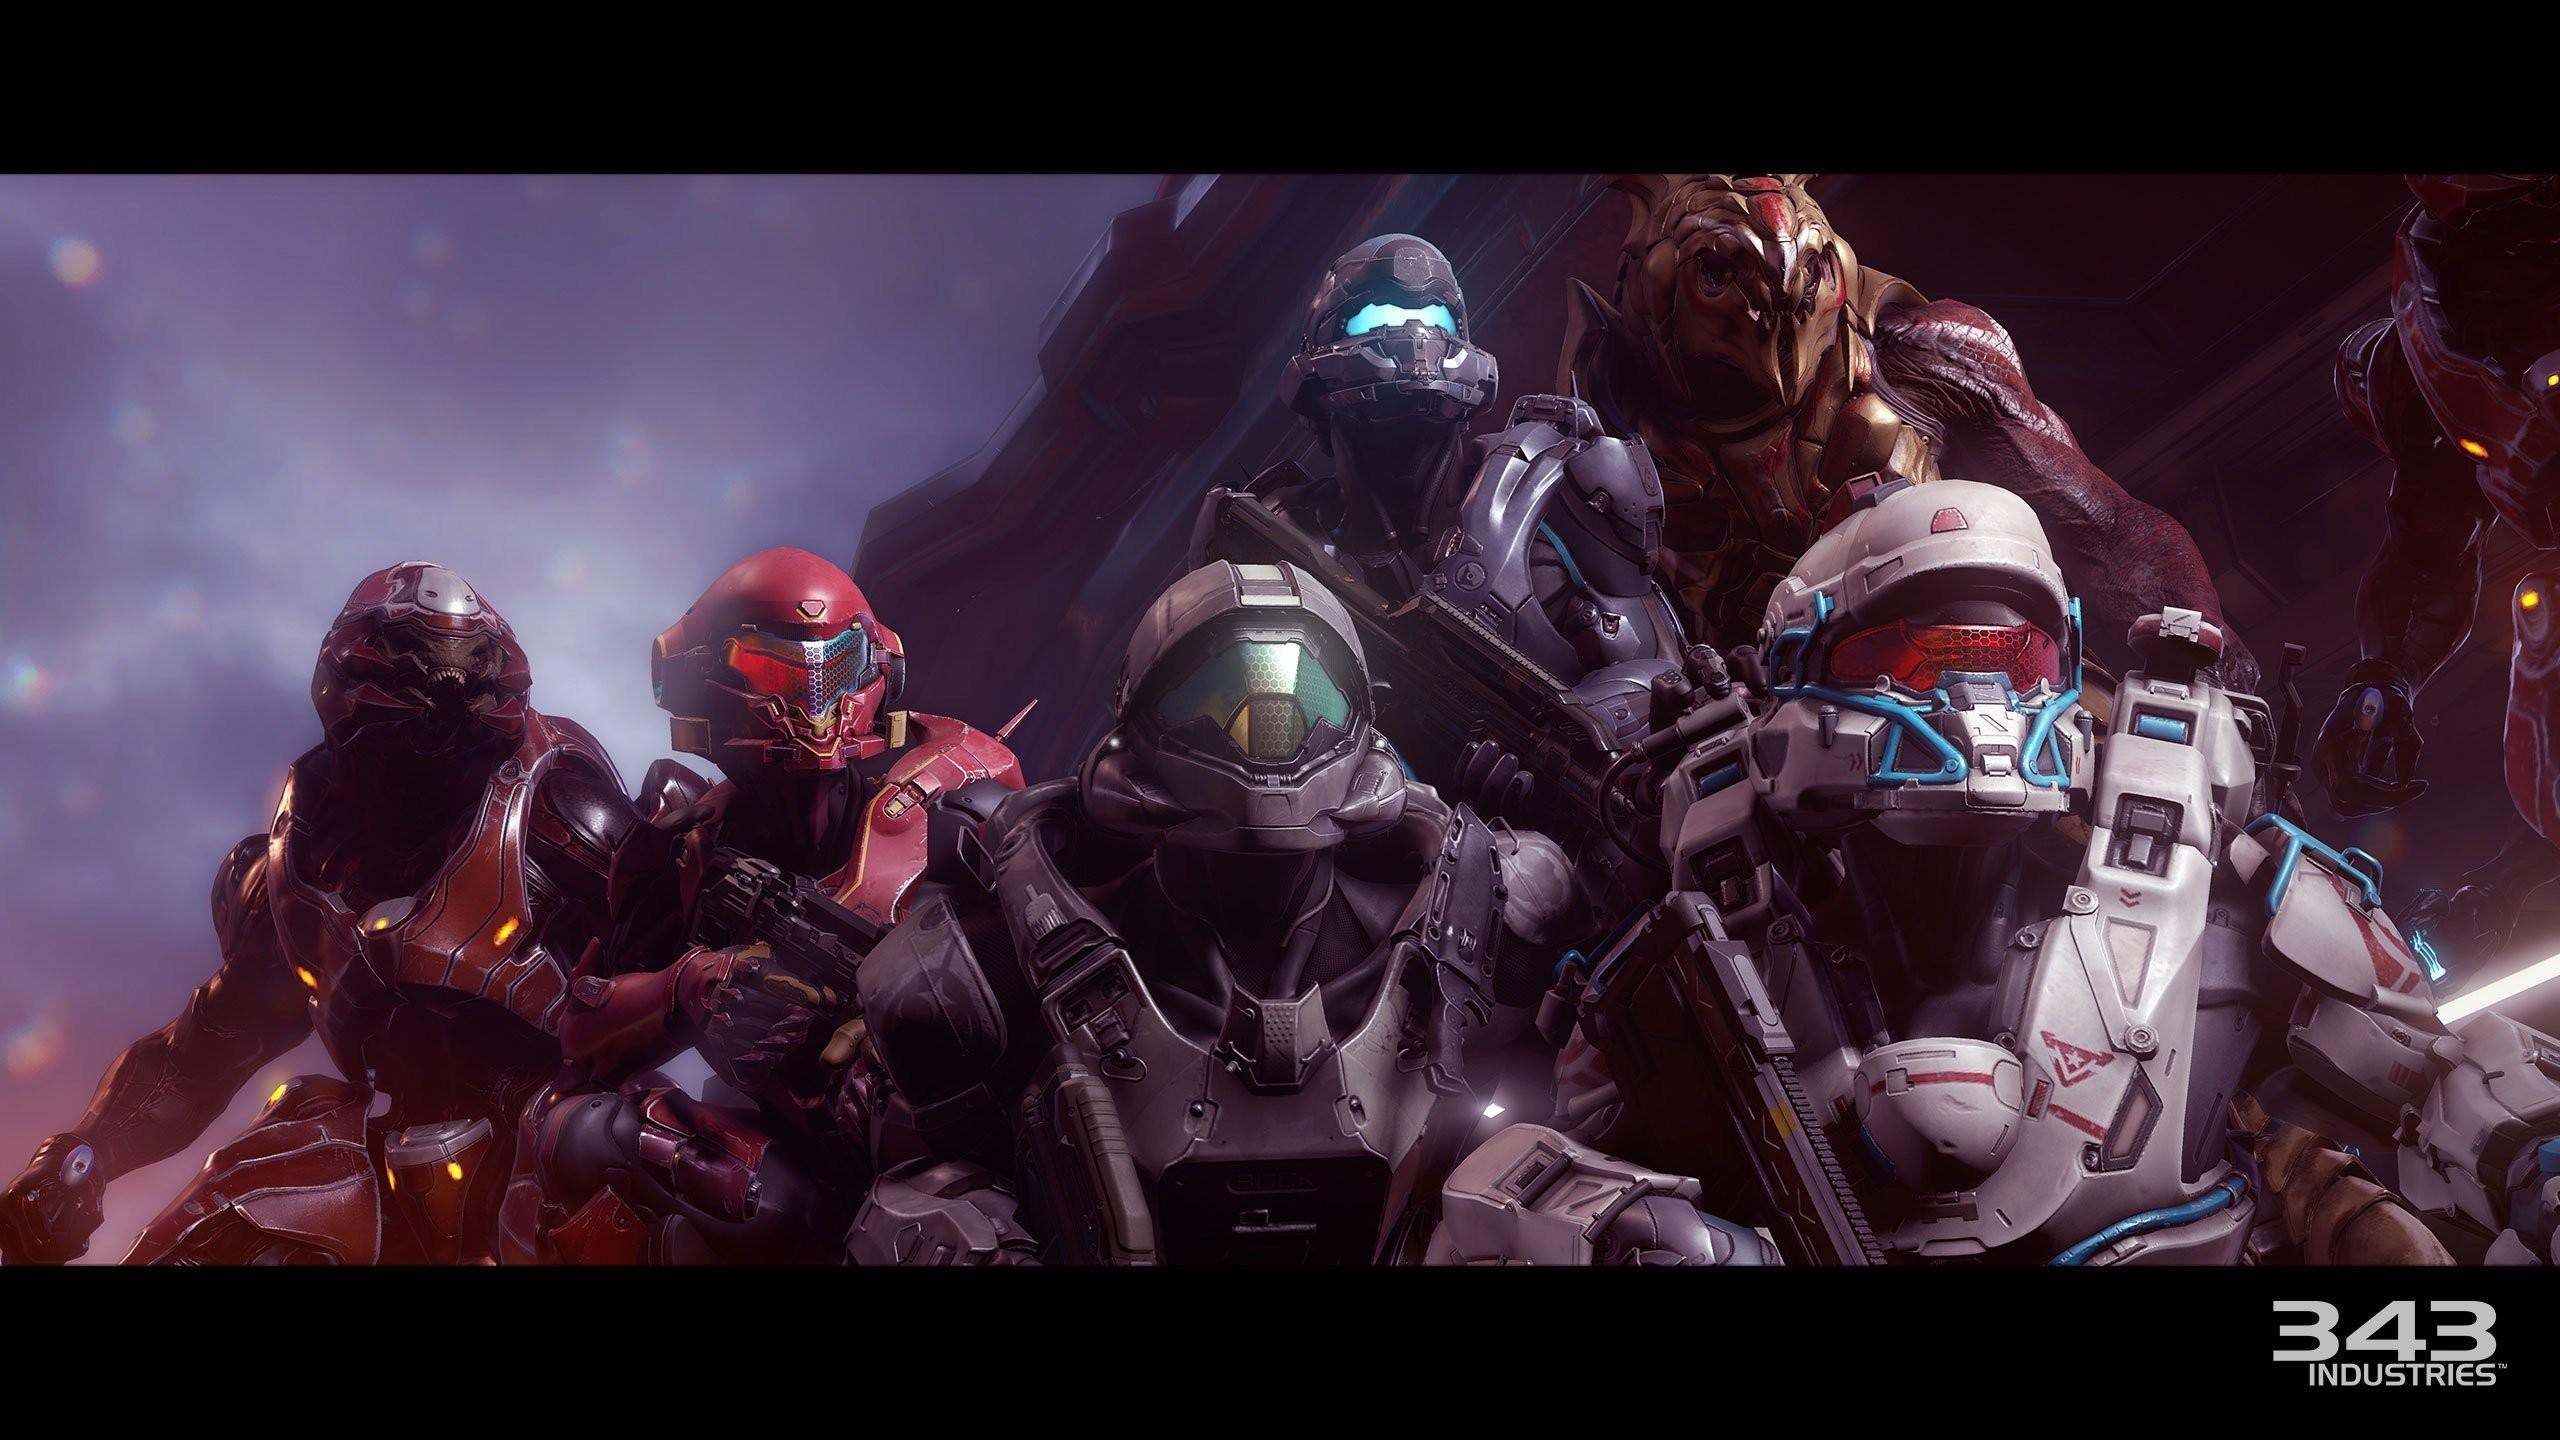 Futuristic Fps Shooter Art Haloguardians Warrior Halo 5